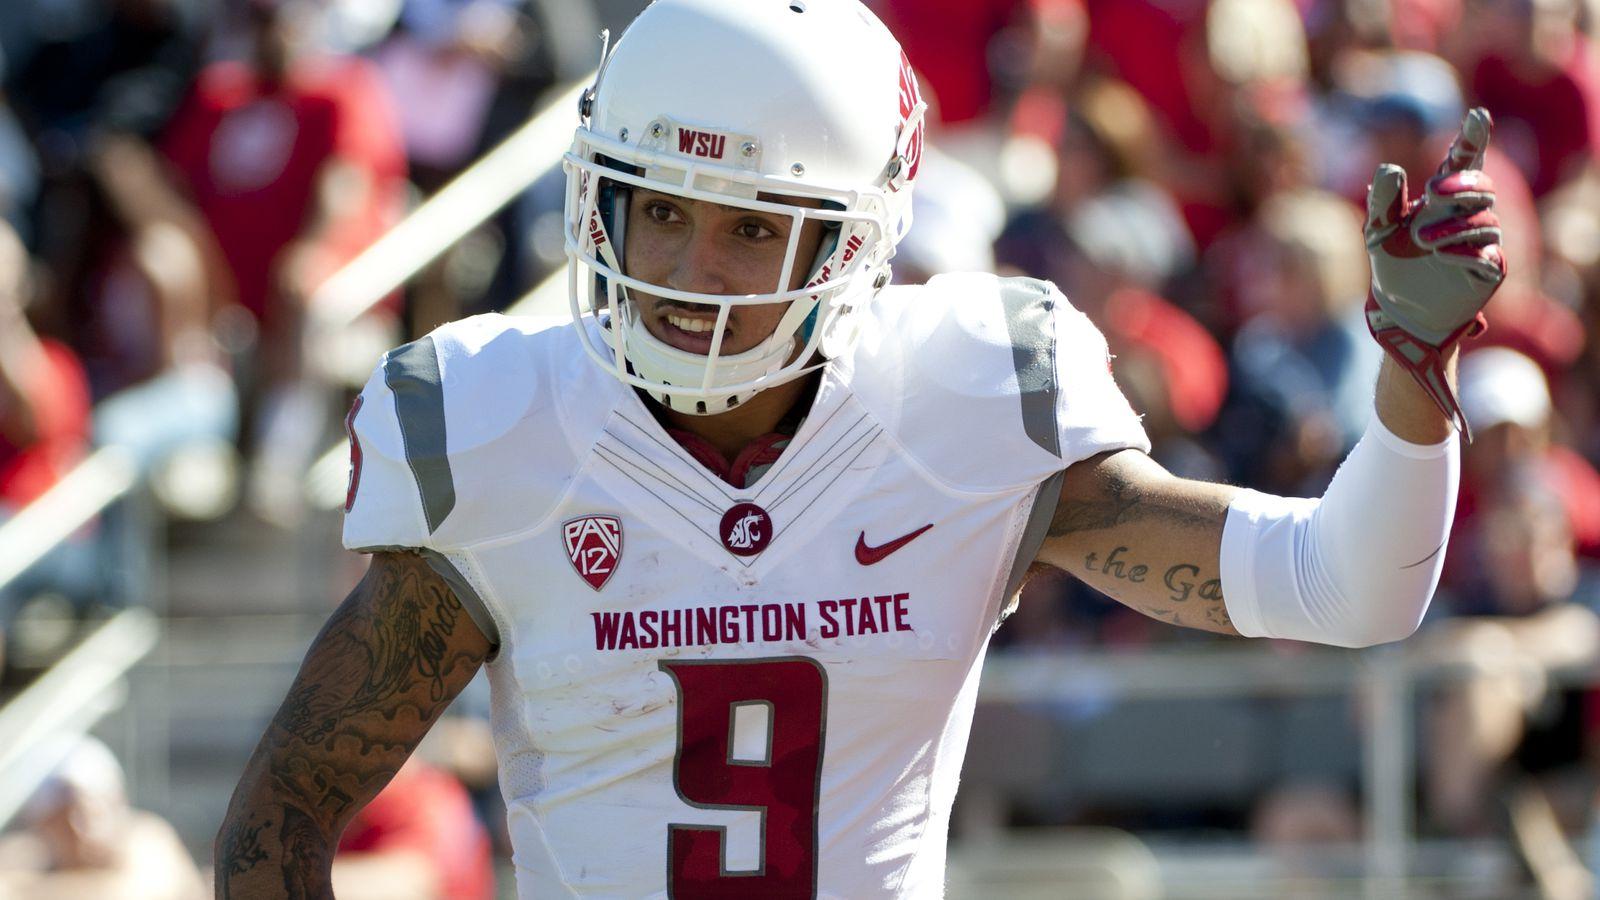 Cheap NFL Jerseys Wholesale - Washington State - Pacific Takes